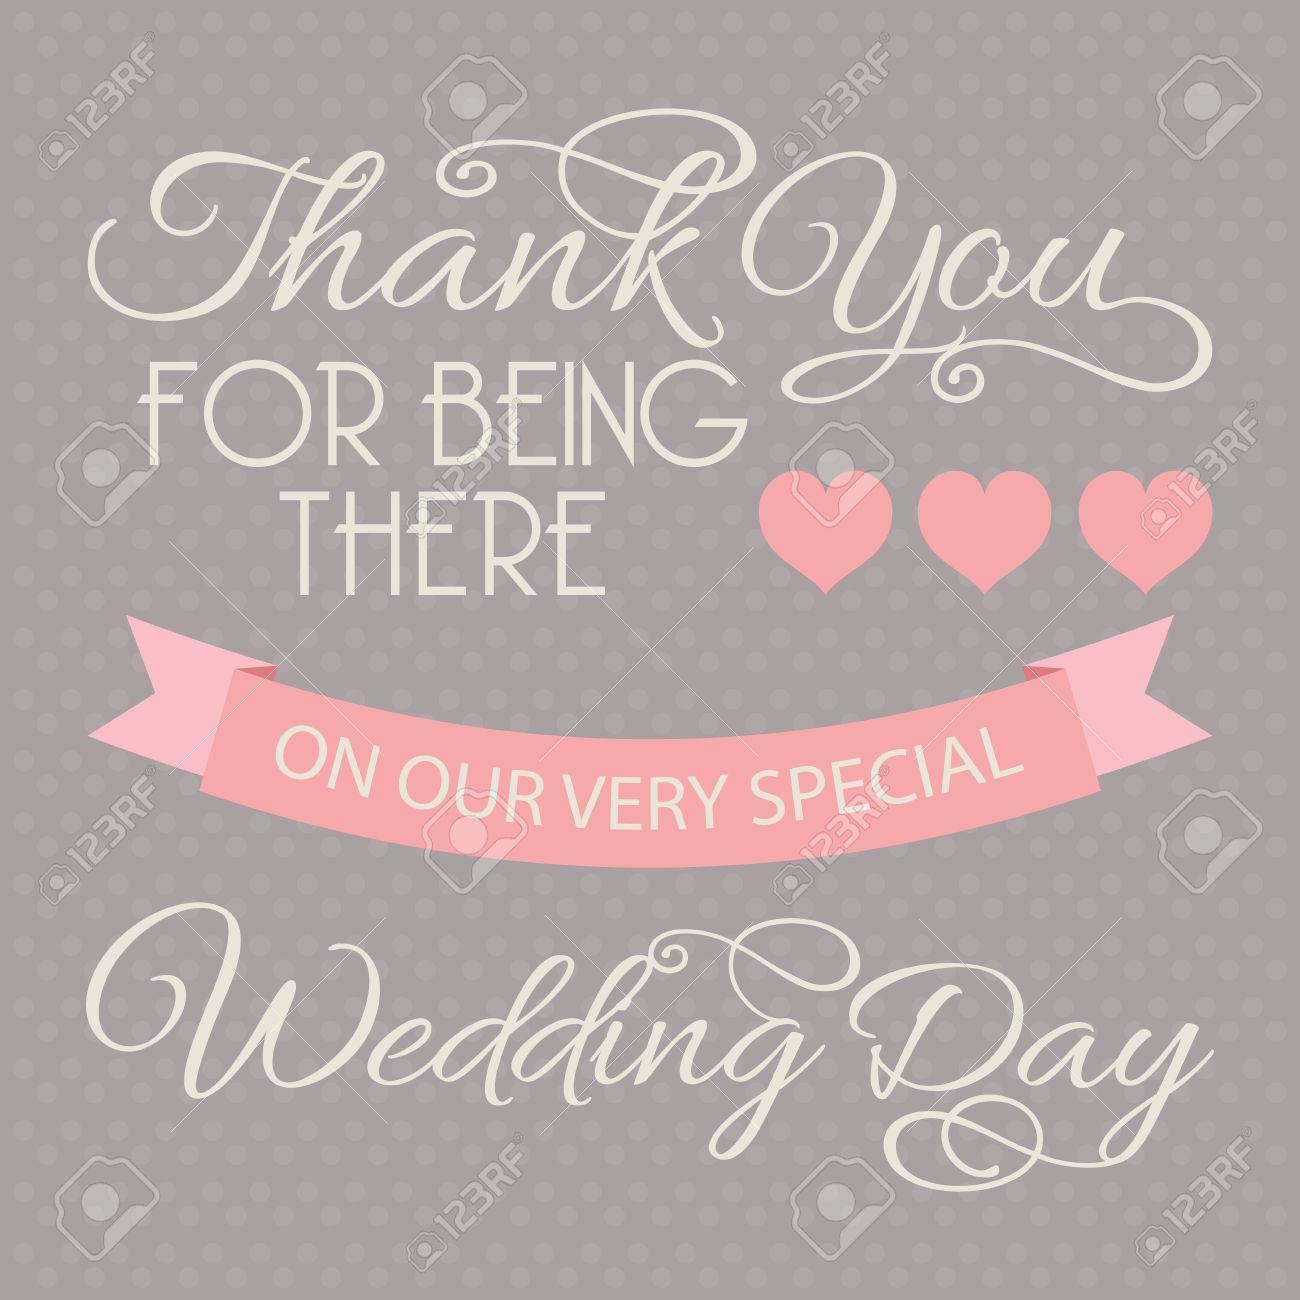 Wedding Thank You Card Template Wedding Design Elements Royalty – Thank You Cards Wedding Template